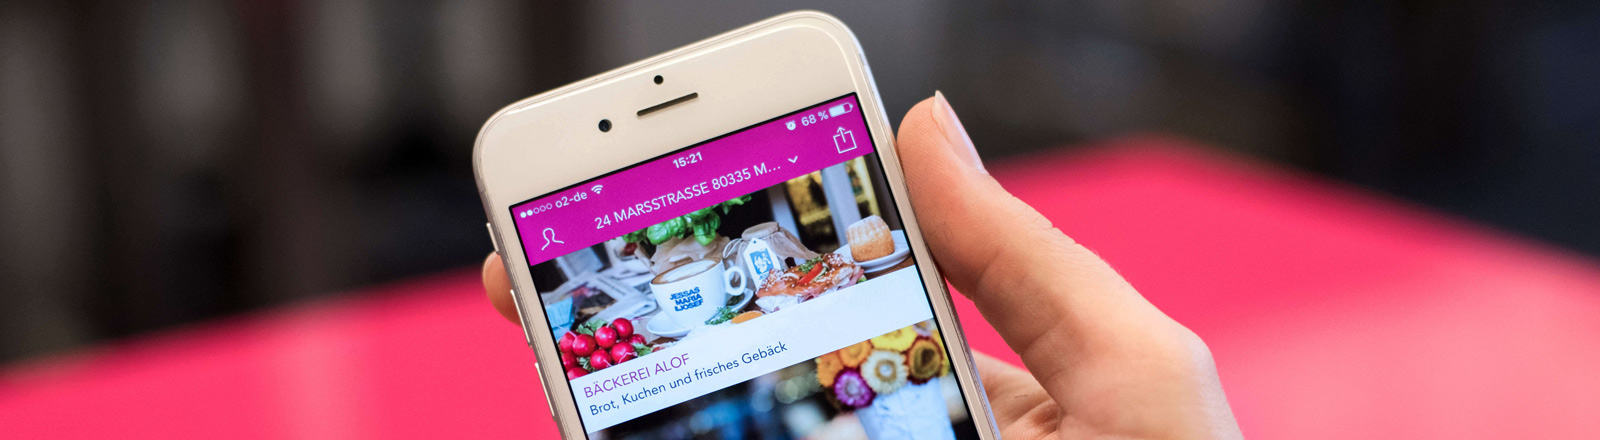 Display der Foodora-App.